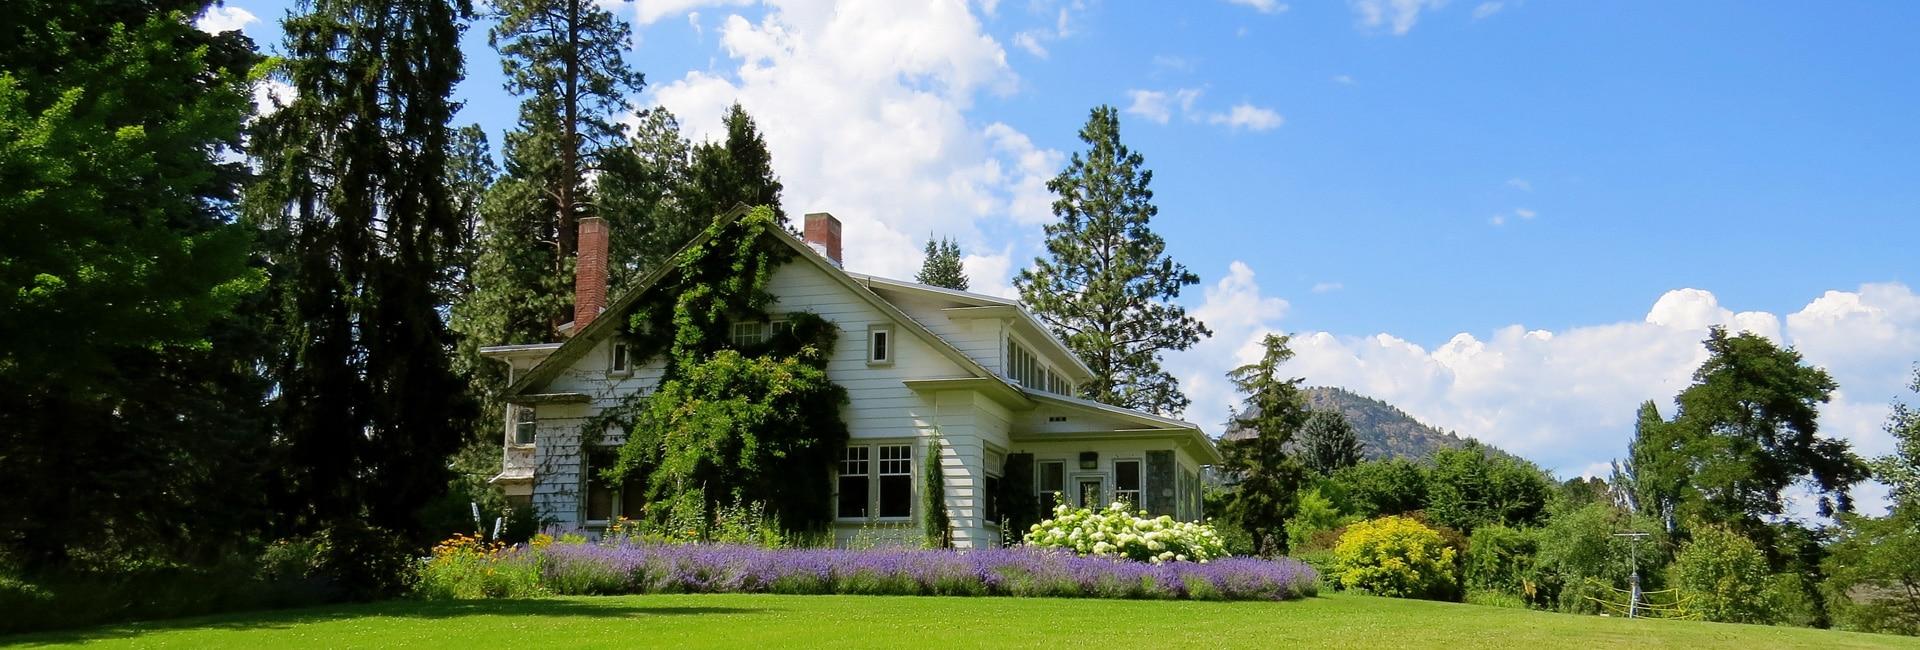 Five Tips for the Best Garden Ever! - Garden